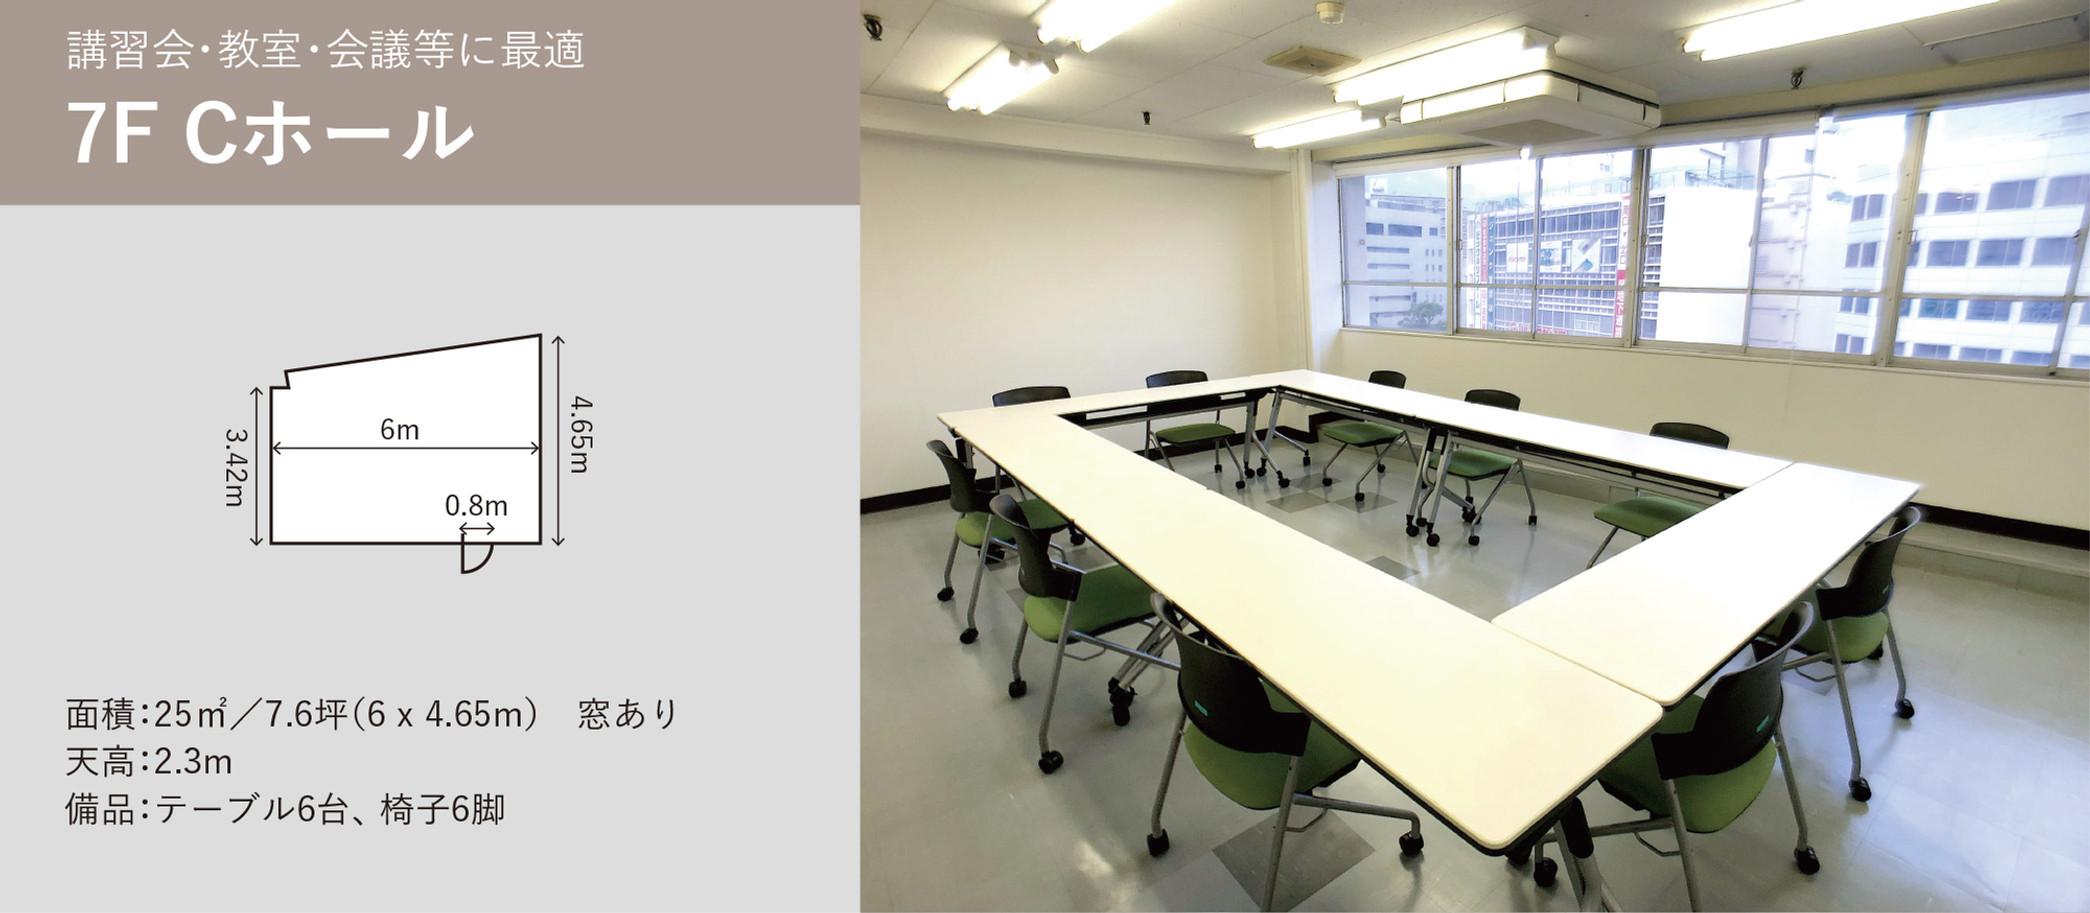 Hall_top_7F_C.jpg